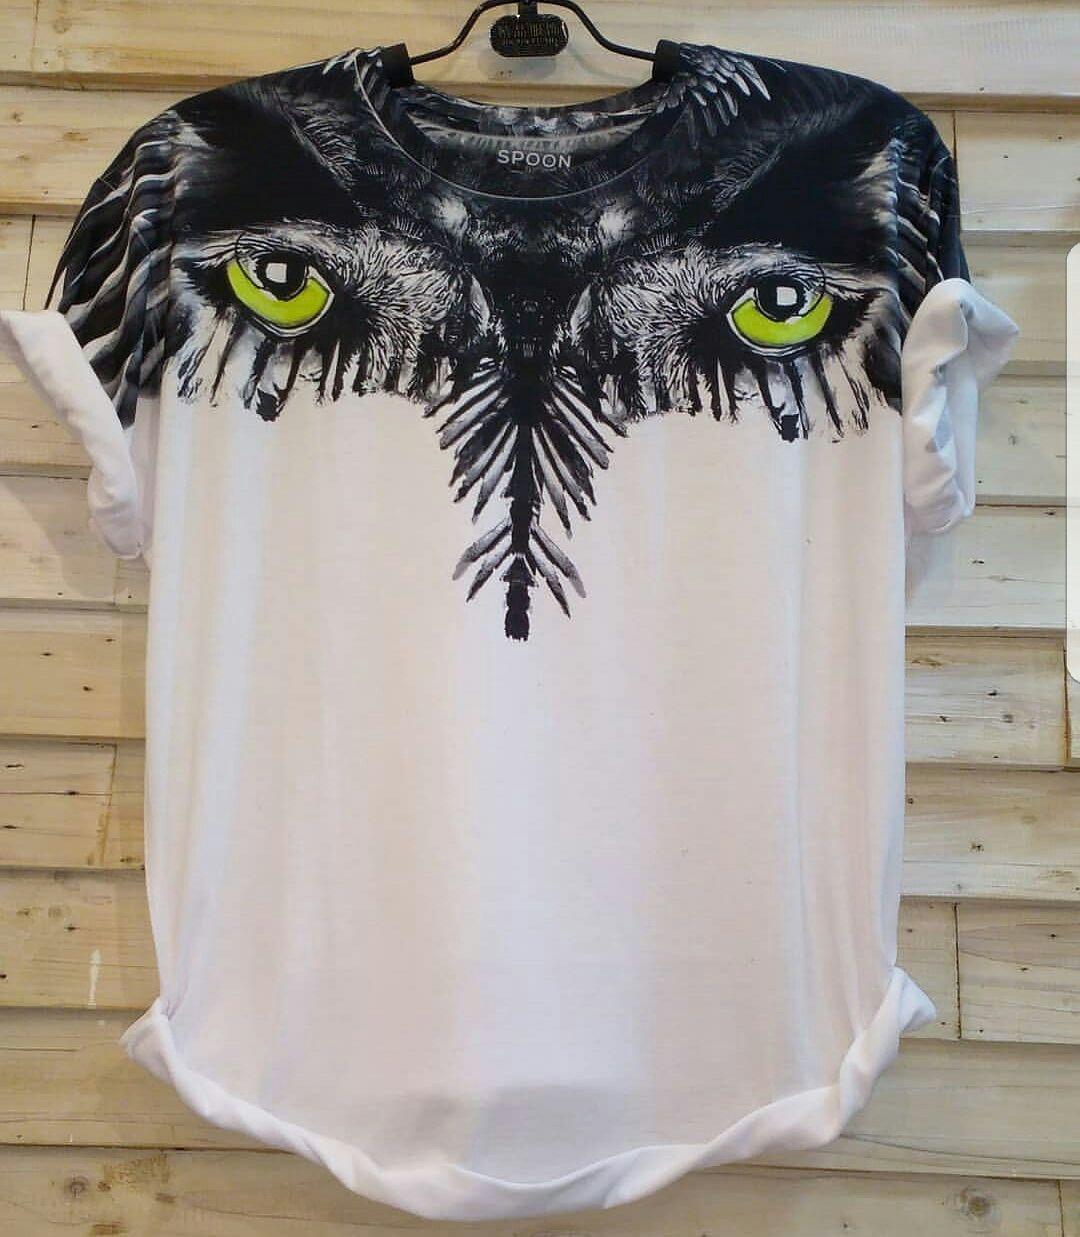 [PROMODISKON] Kaos/Baju Gambar Pria Dewasa Bahan Spandex Import Murah Meriah